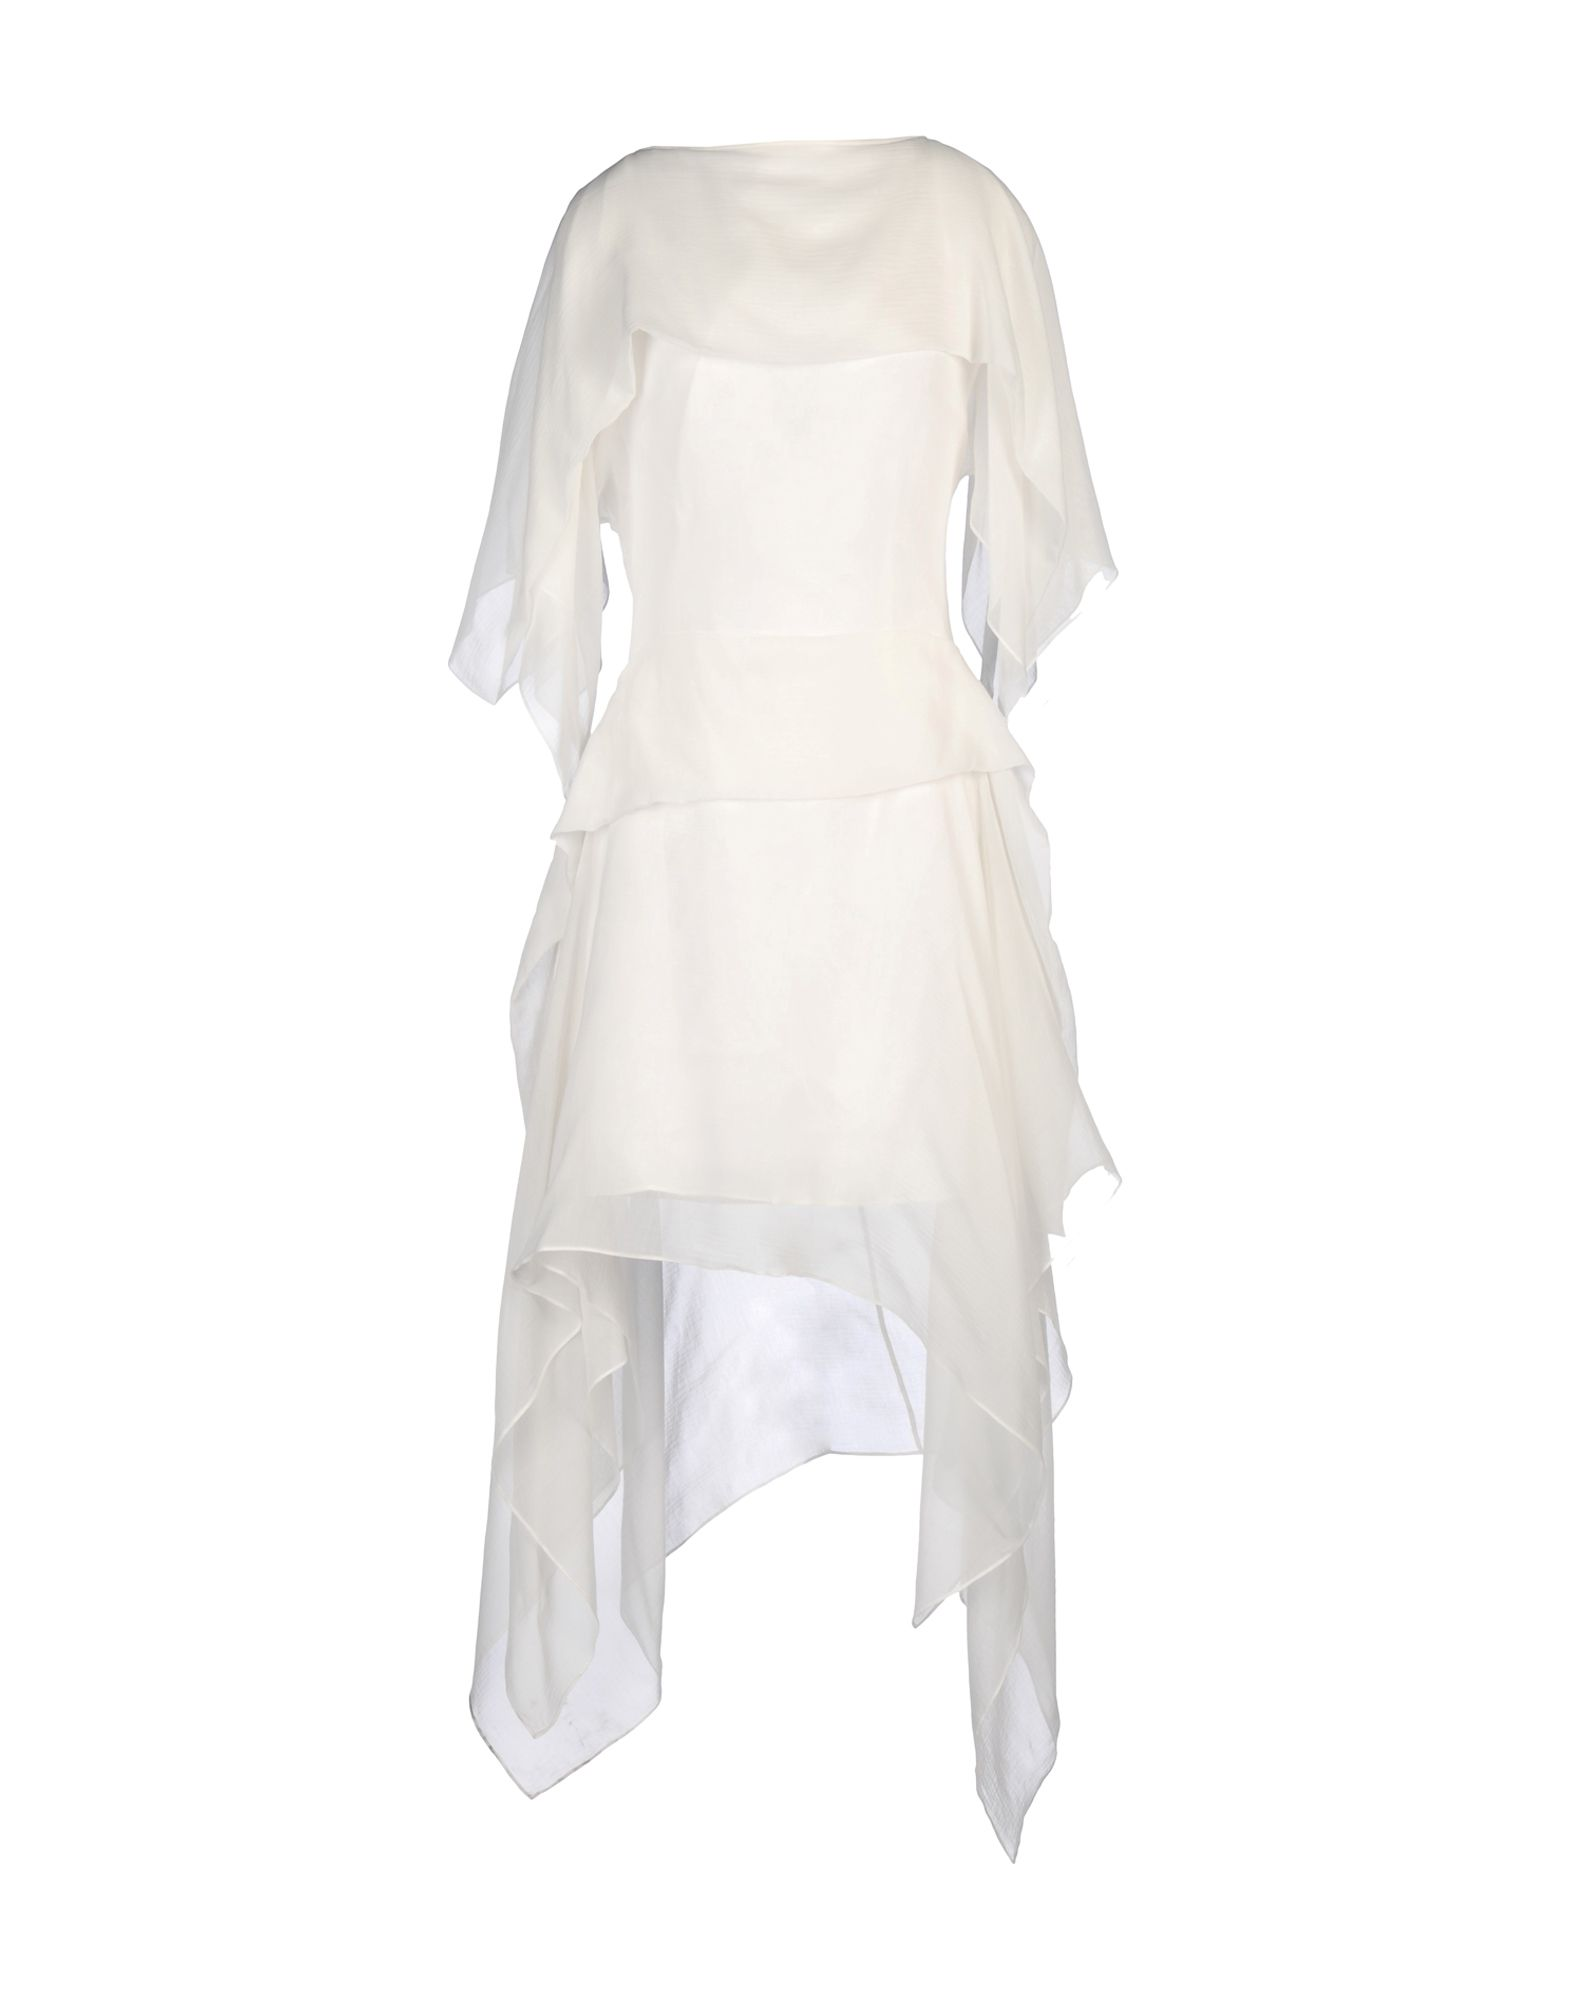 JEAN PAUL GAULTIER Платье длиной 3/4 jean paul gaultier платье до колена